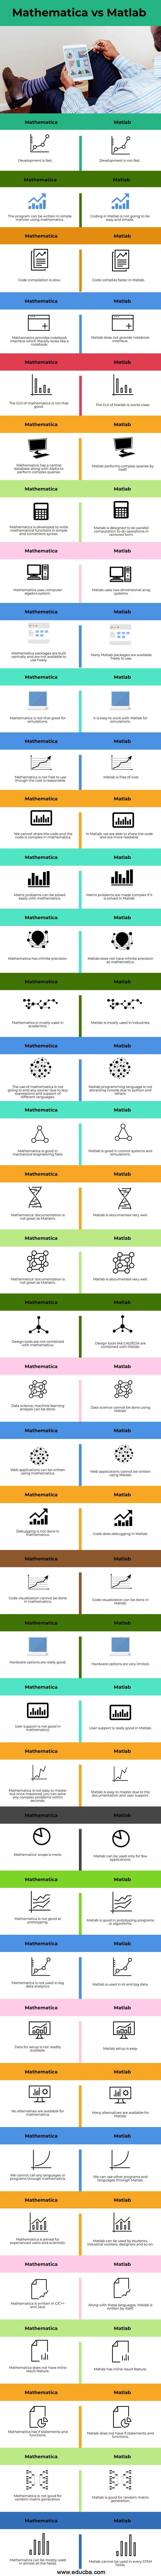 Mathematica vs Matlab info